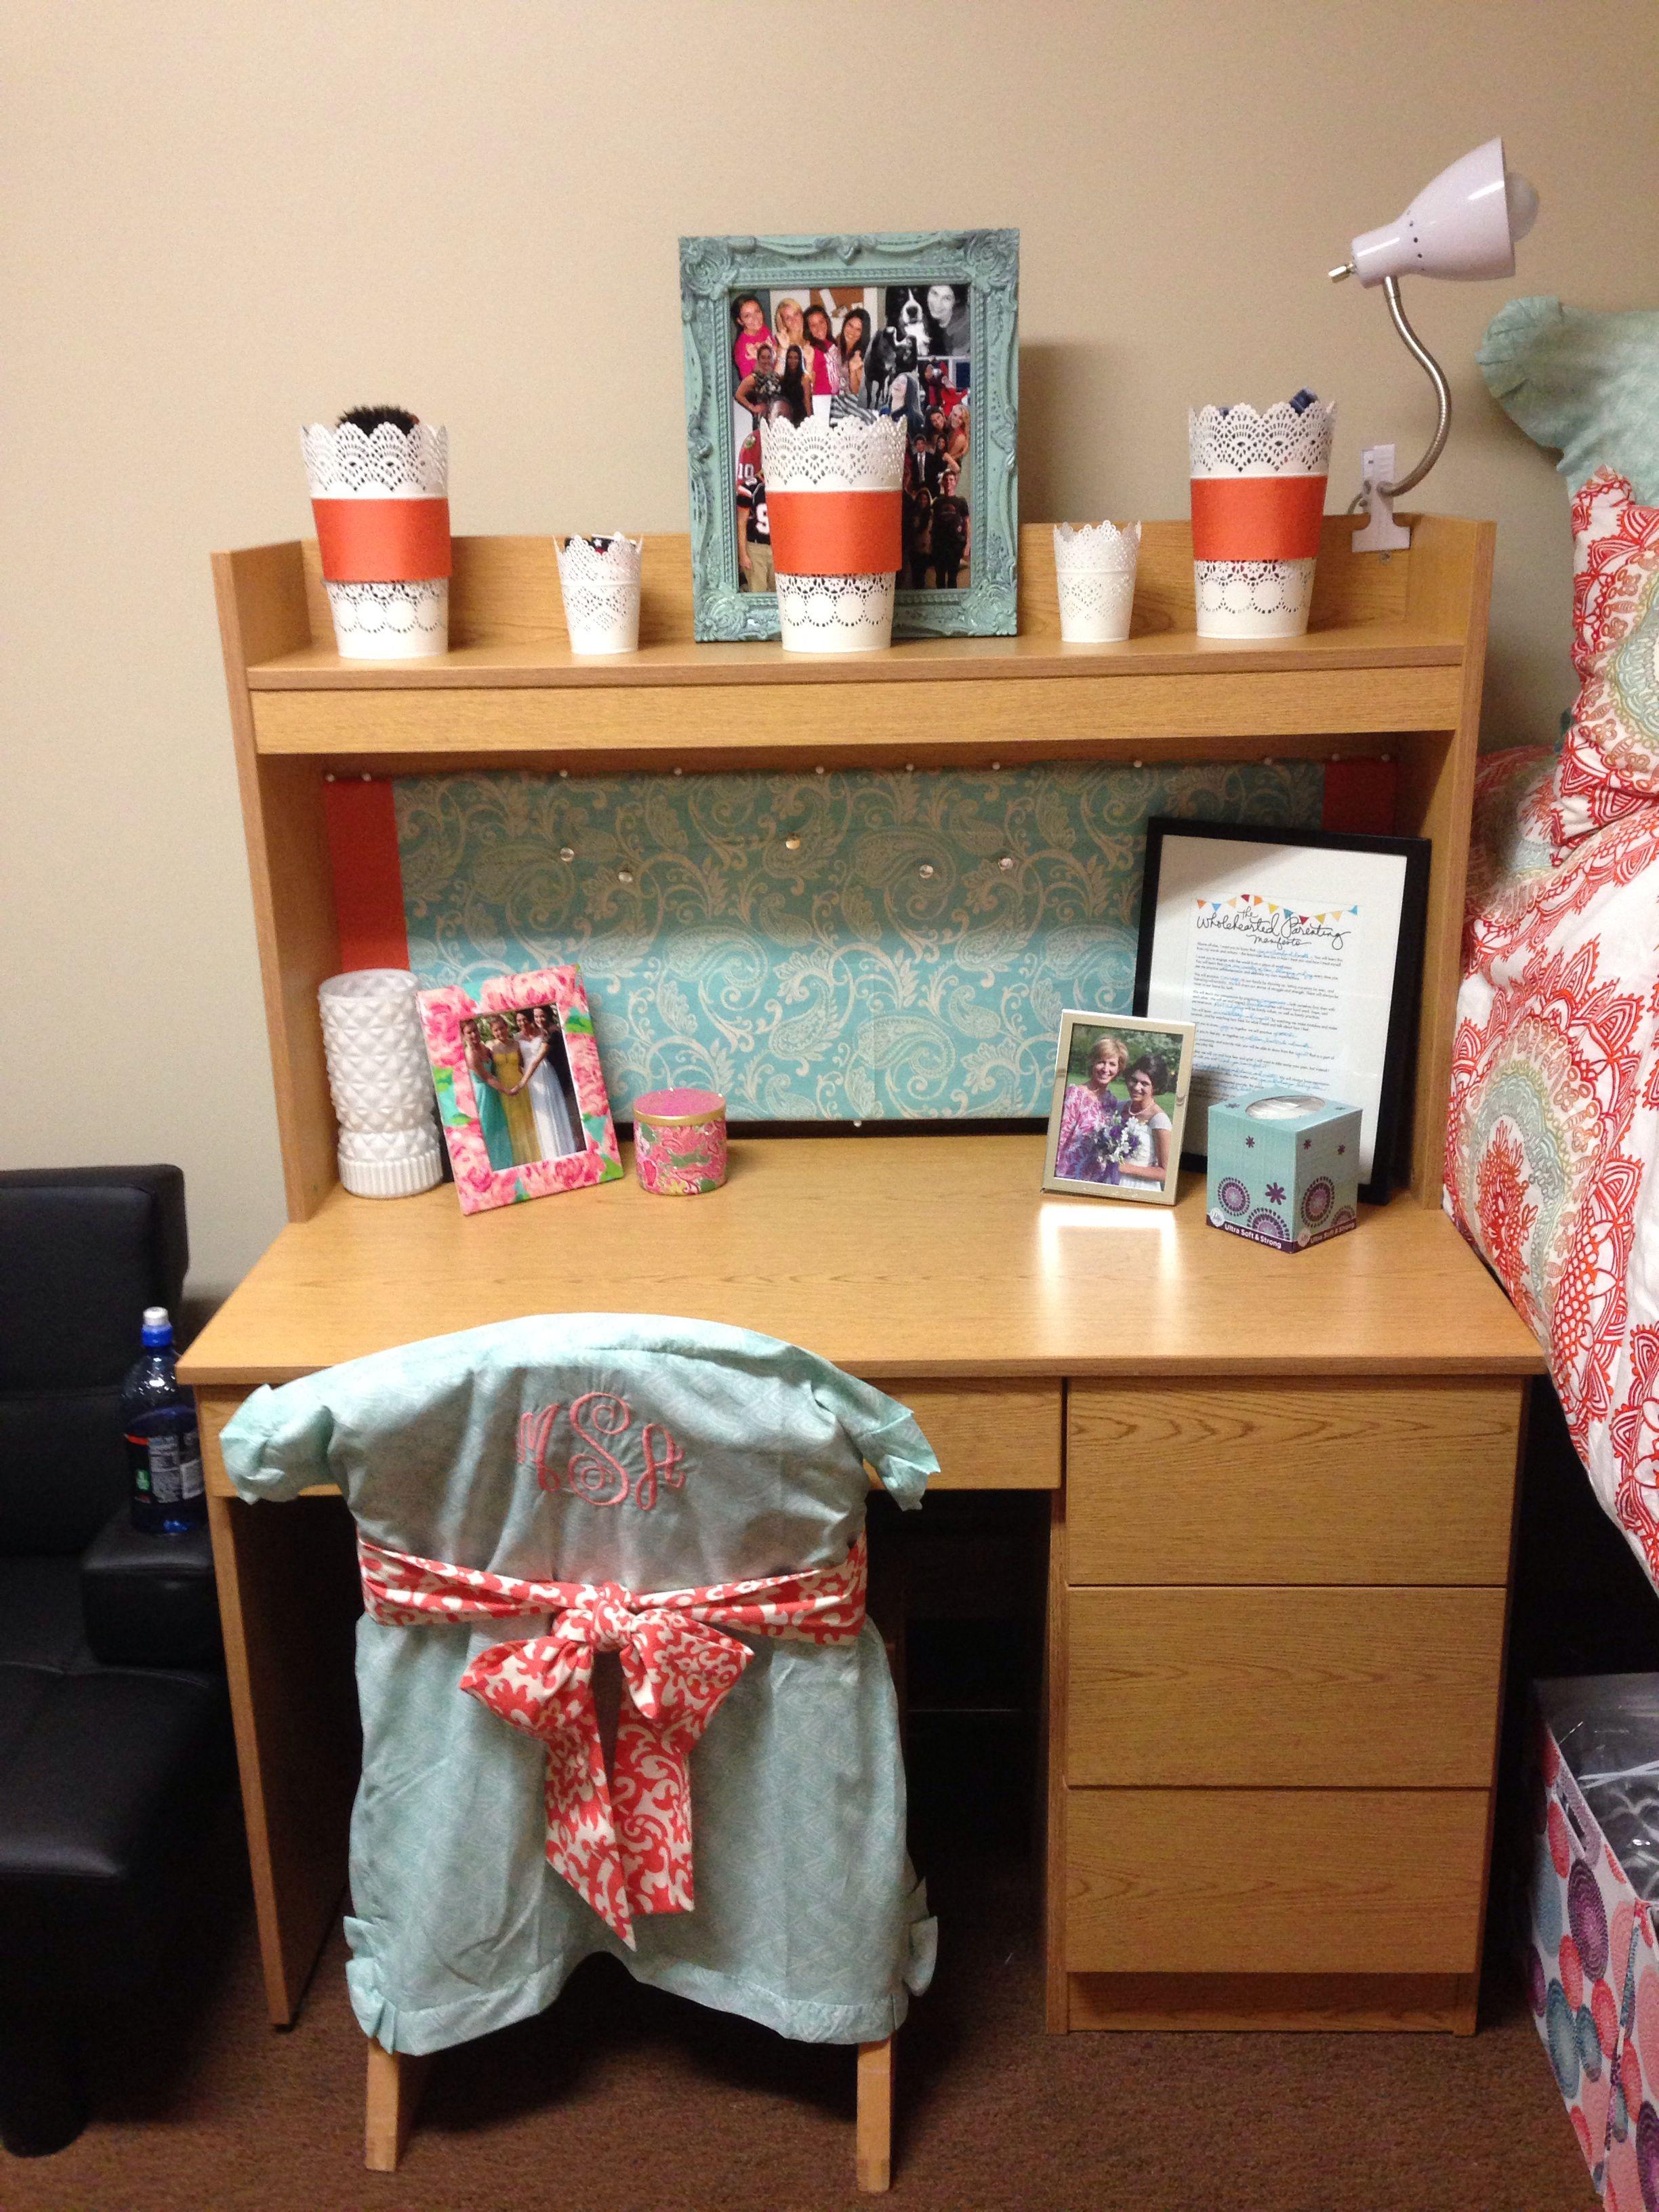 Dorm Chair Covers Etsy Futon Sleeper Pinterest Makeitmadidorm Desk And Monogram Cover